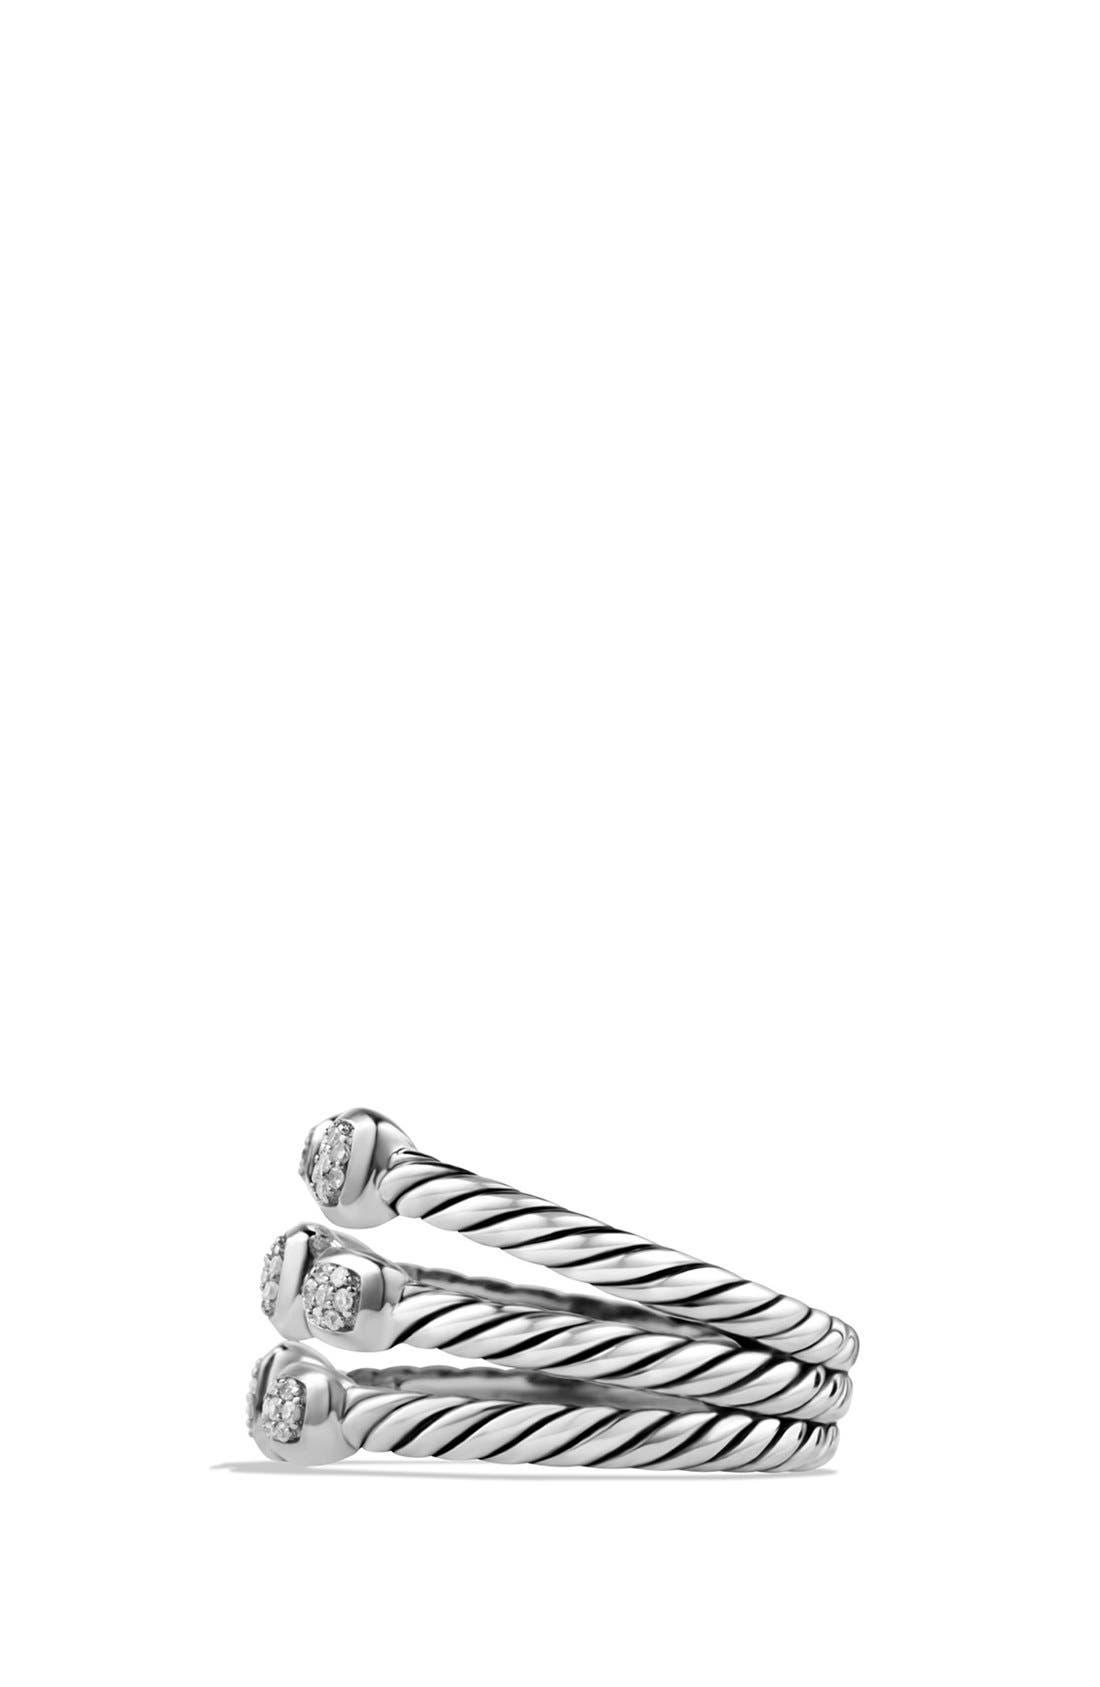 'Confetti' Ring with Diamonds,                             Alternate thumbnail 4, color,                             040